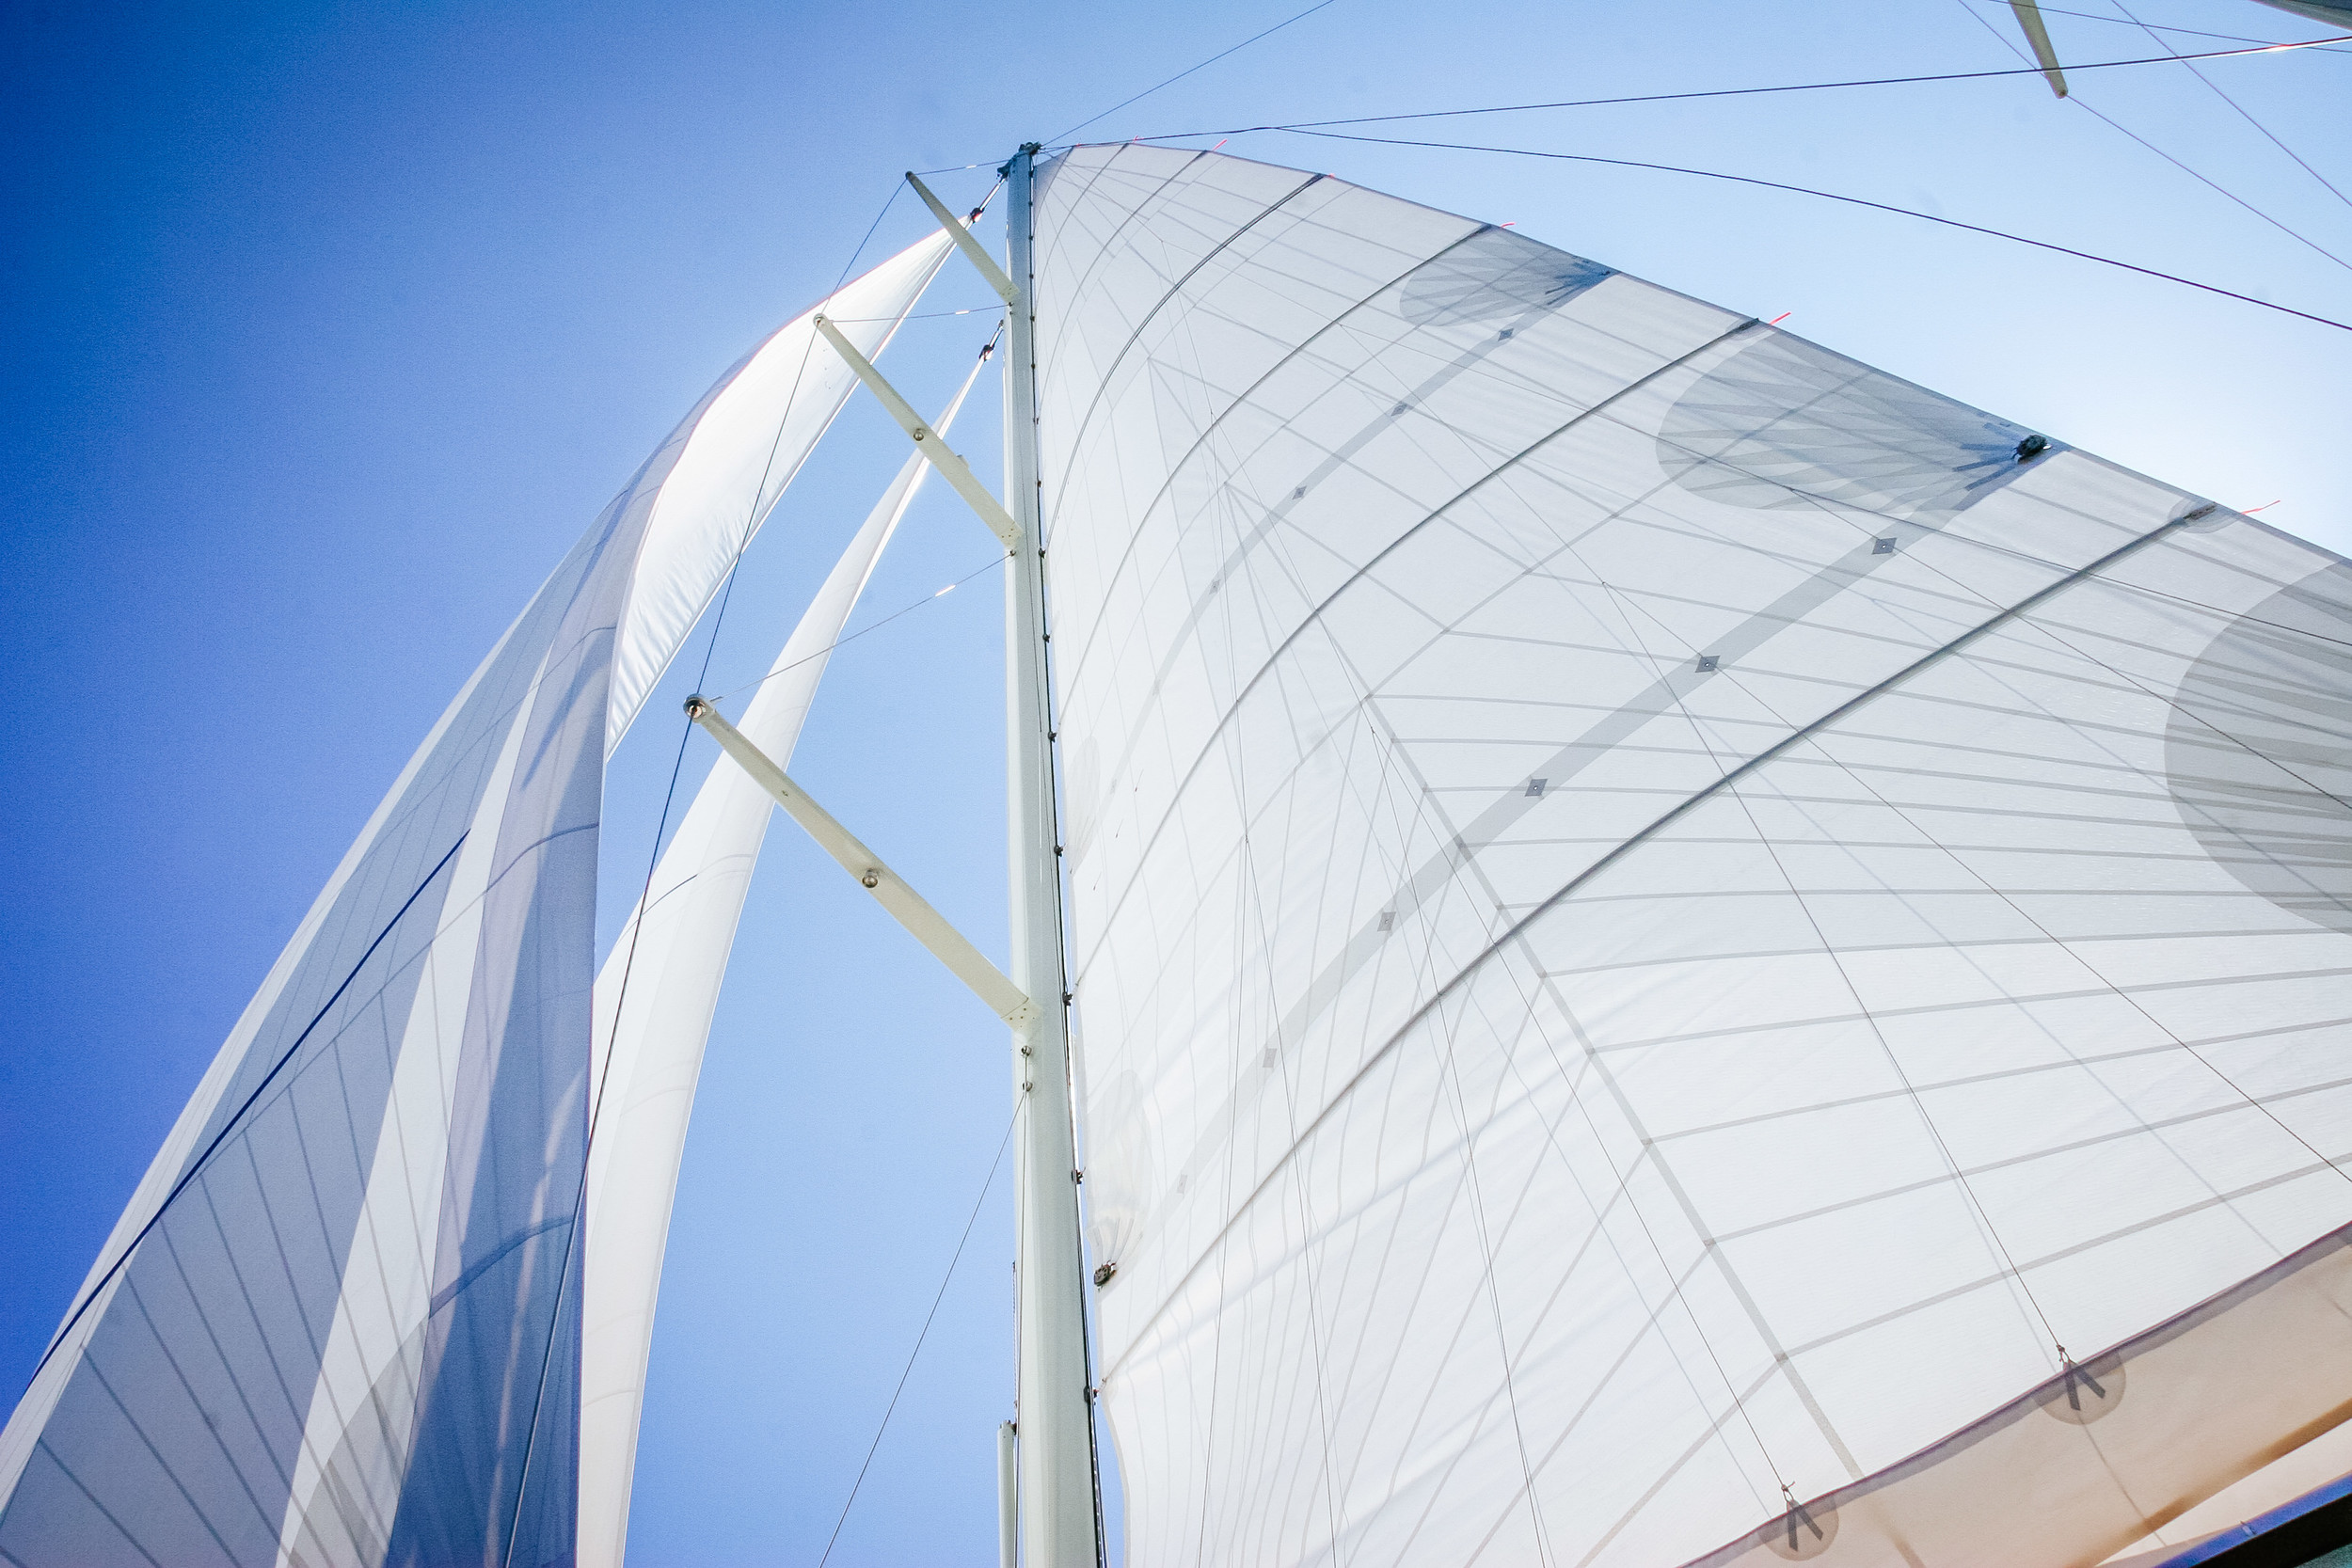 UK Sailmakers tri-radial Spectra full length batten cruising mainsail. Click to enlarge.